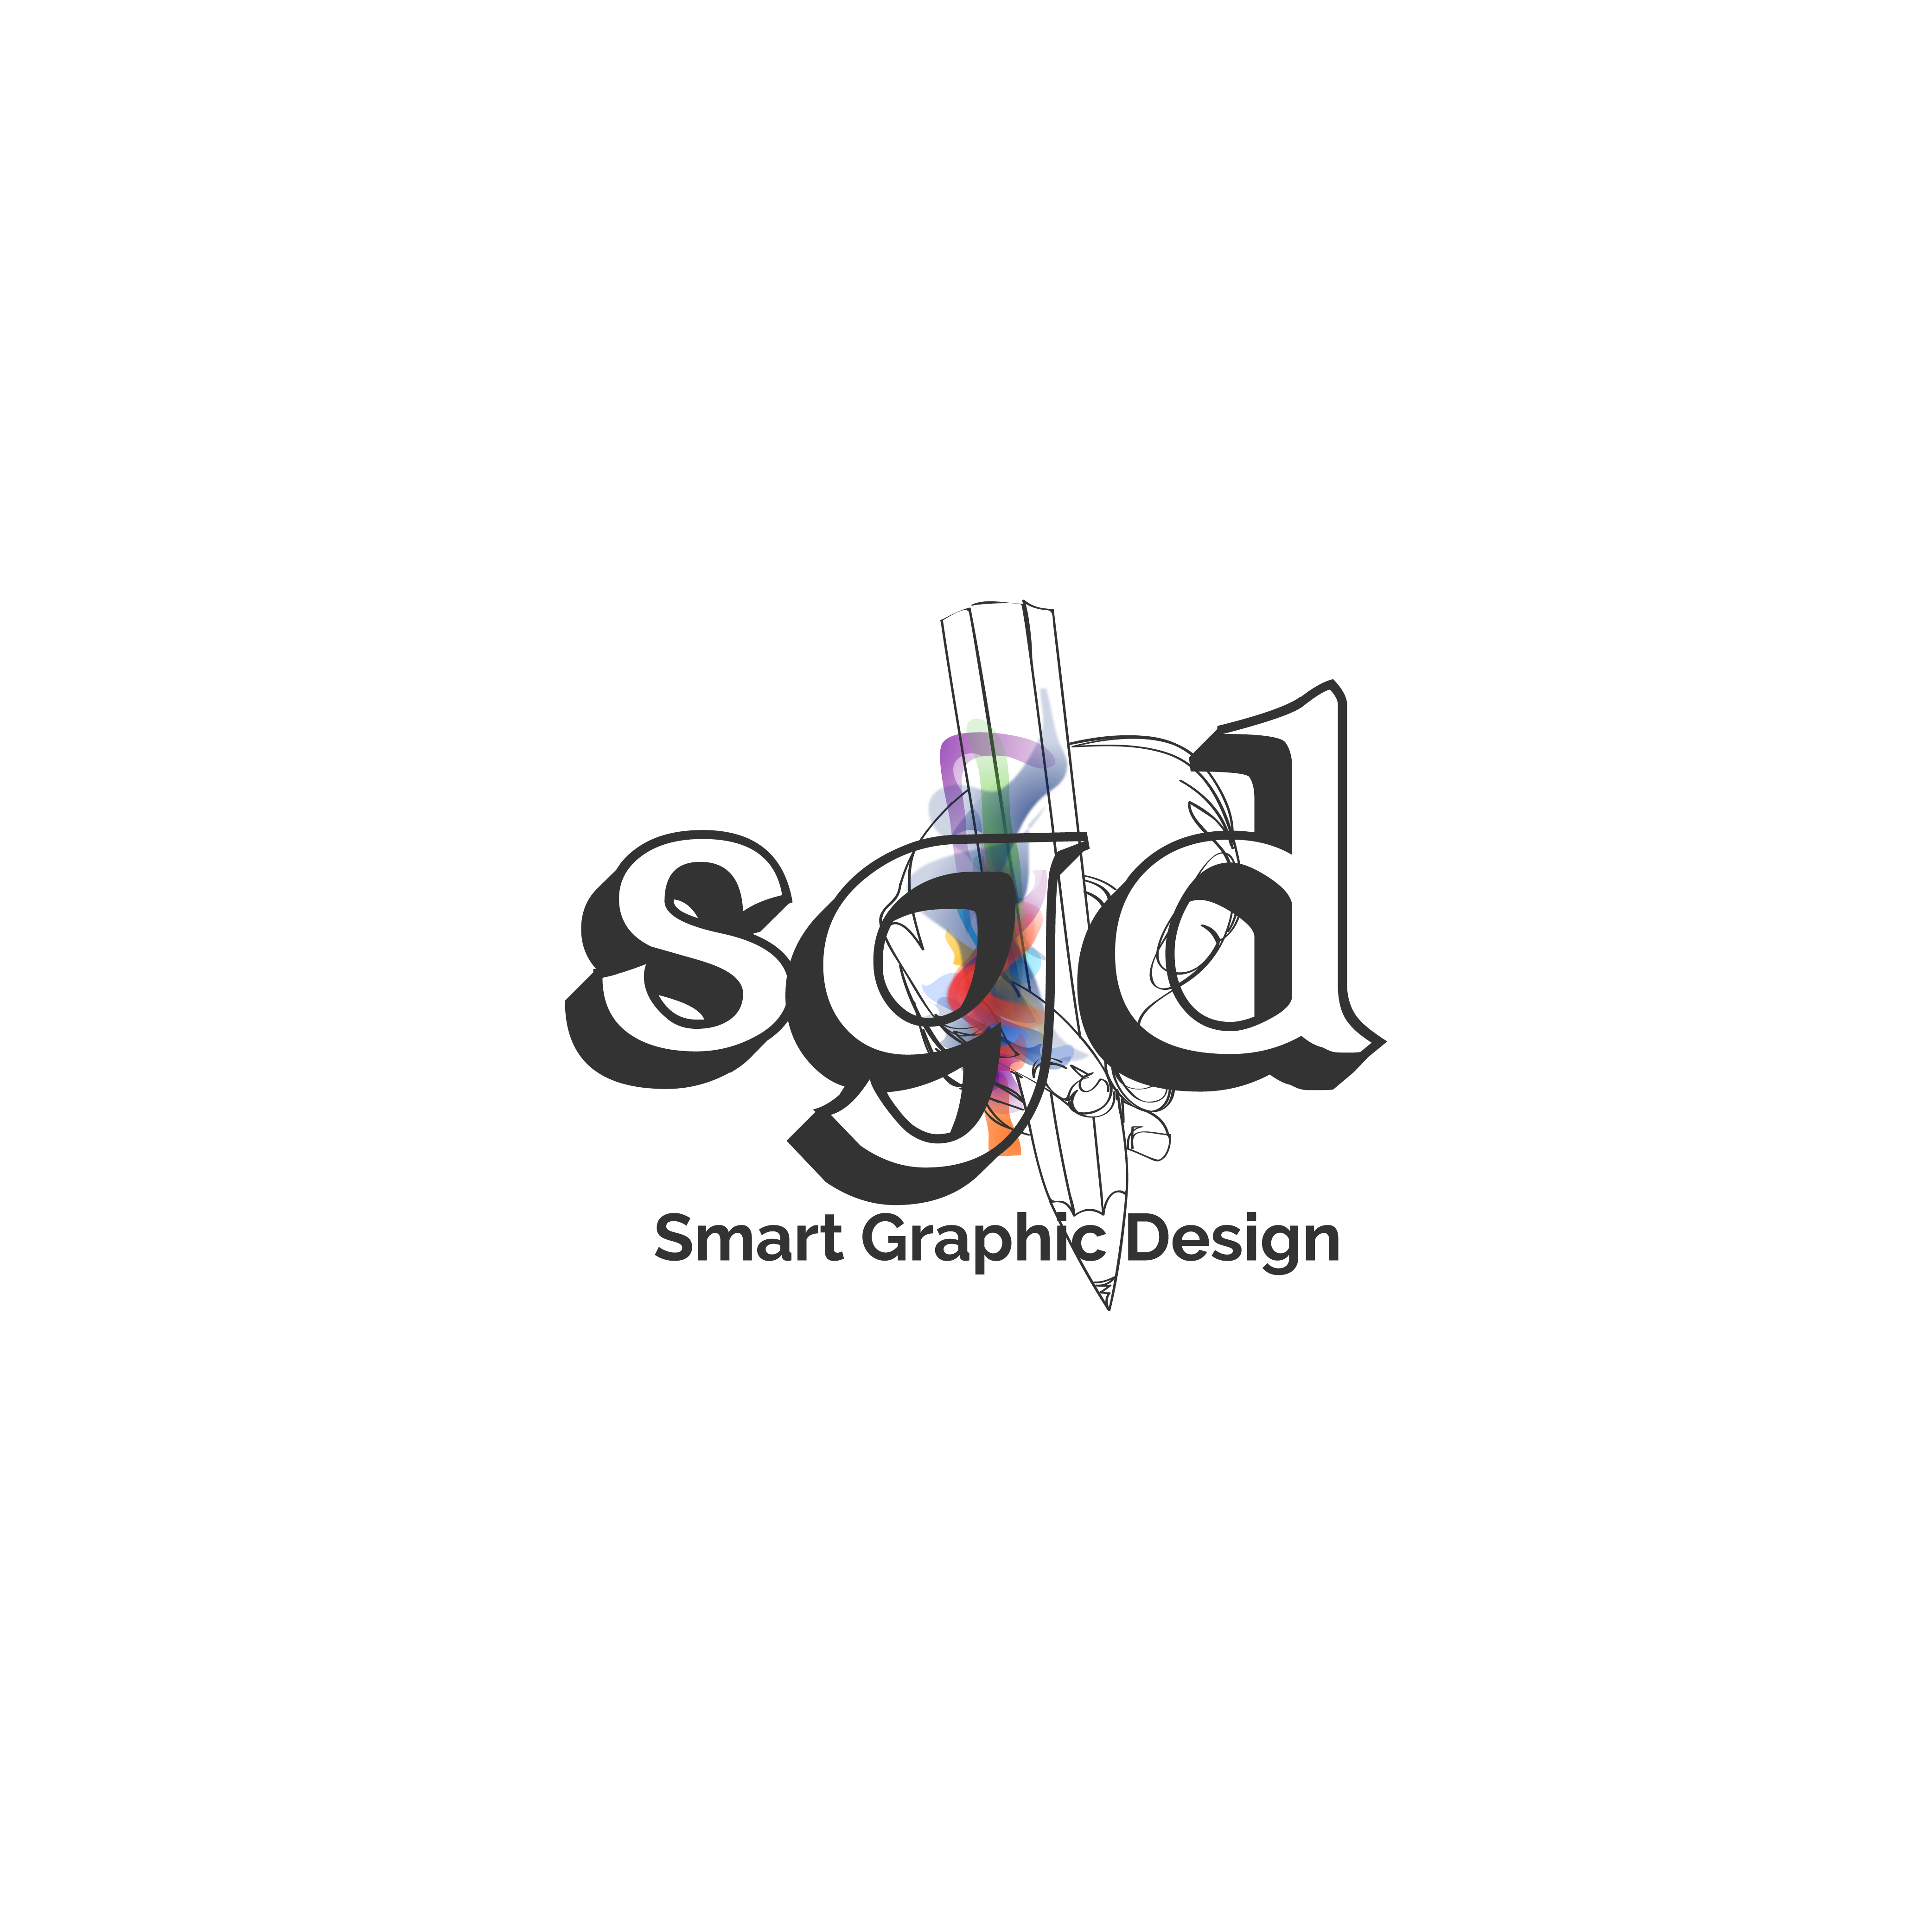 Smart Graphic Design